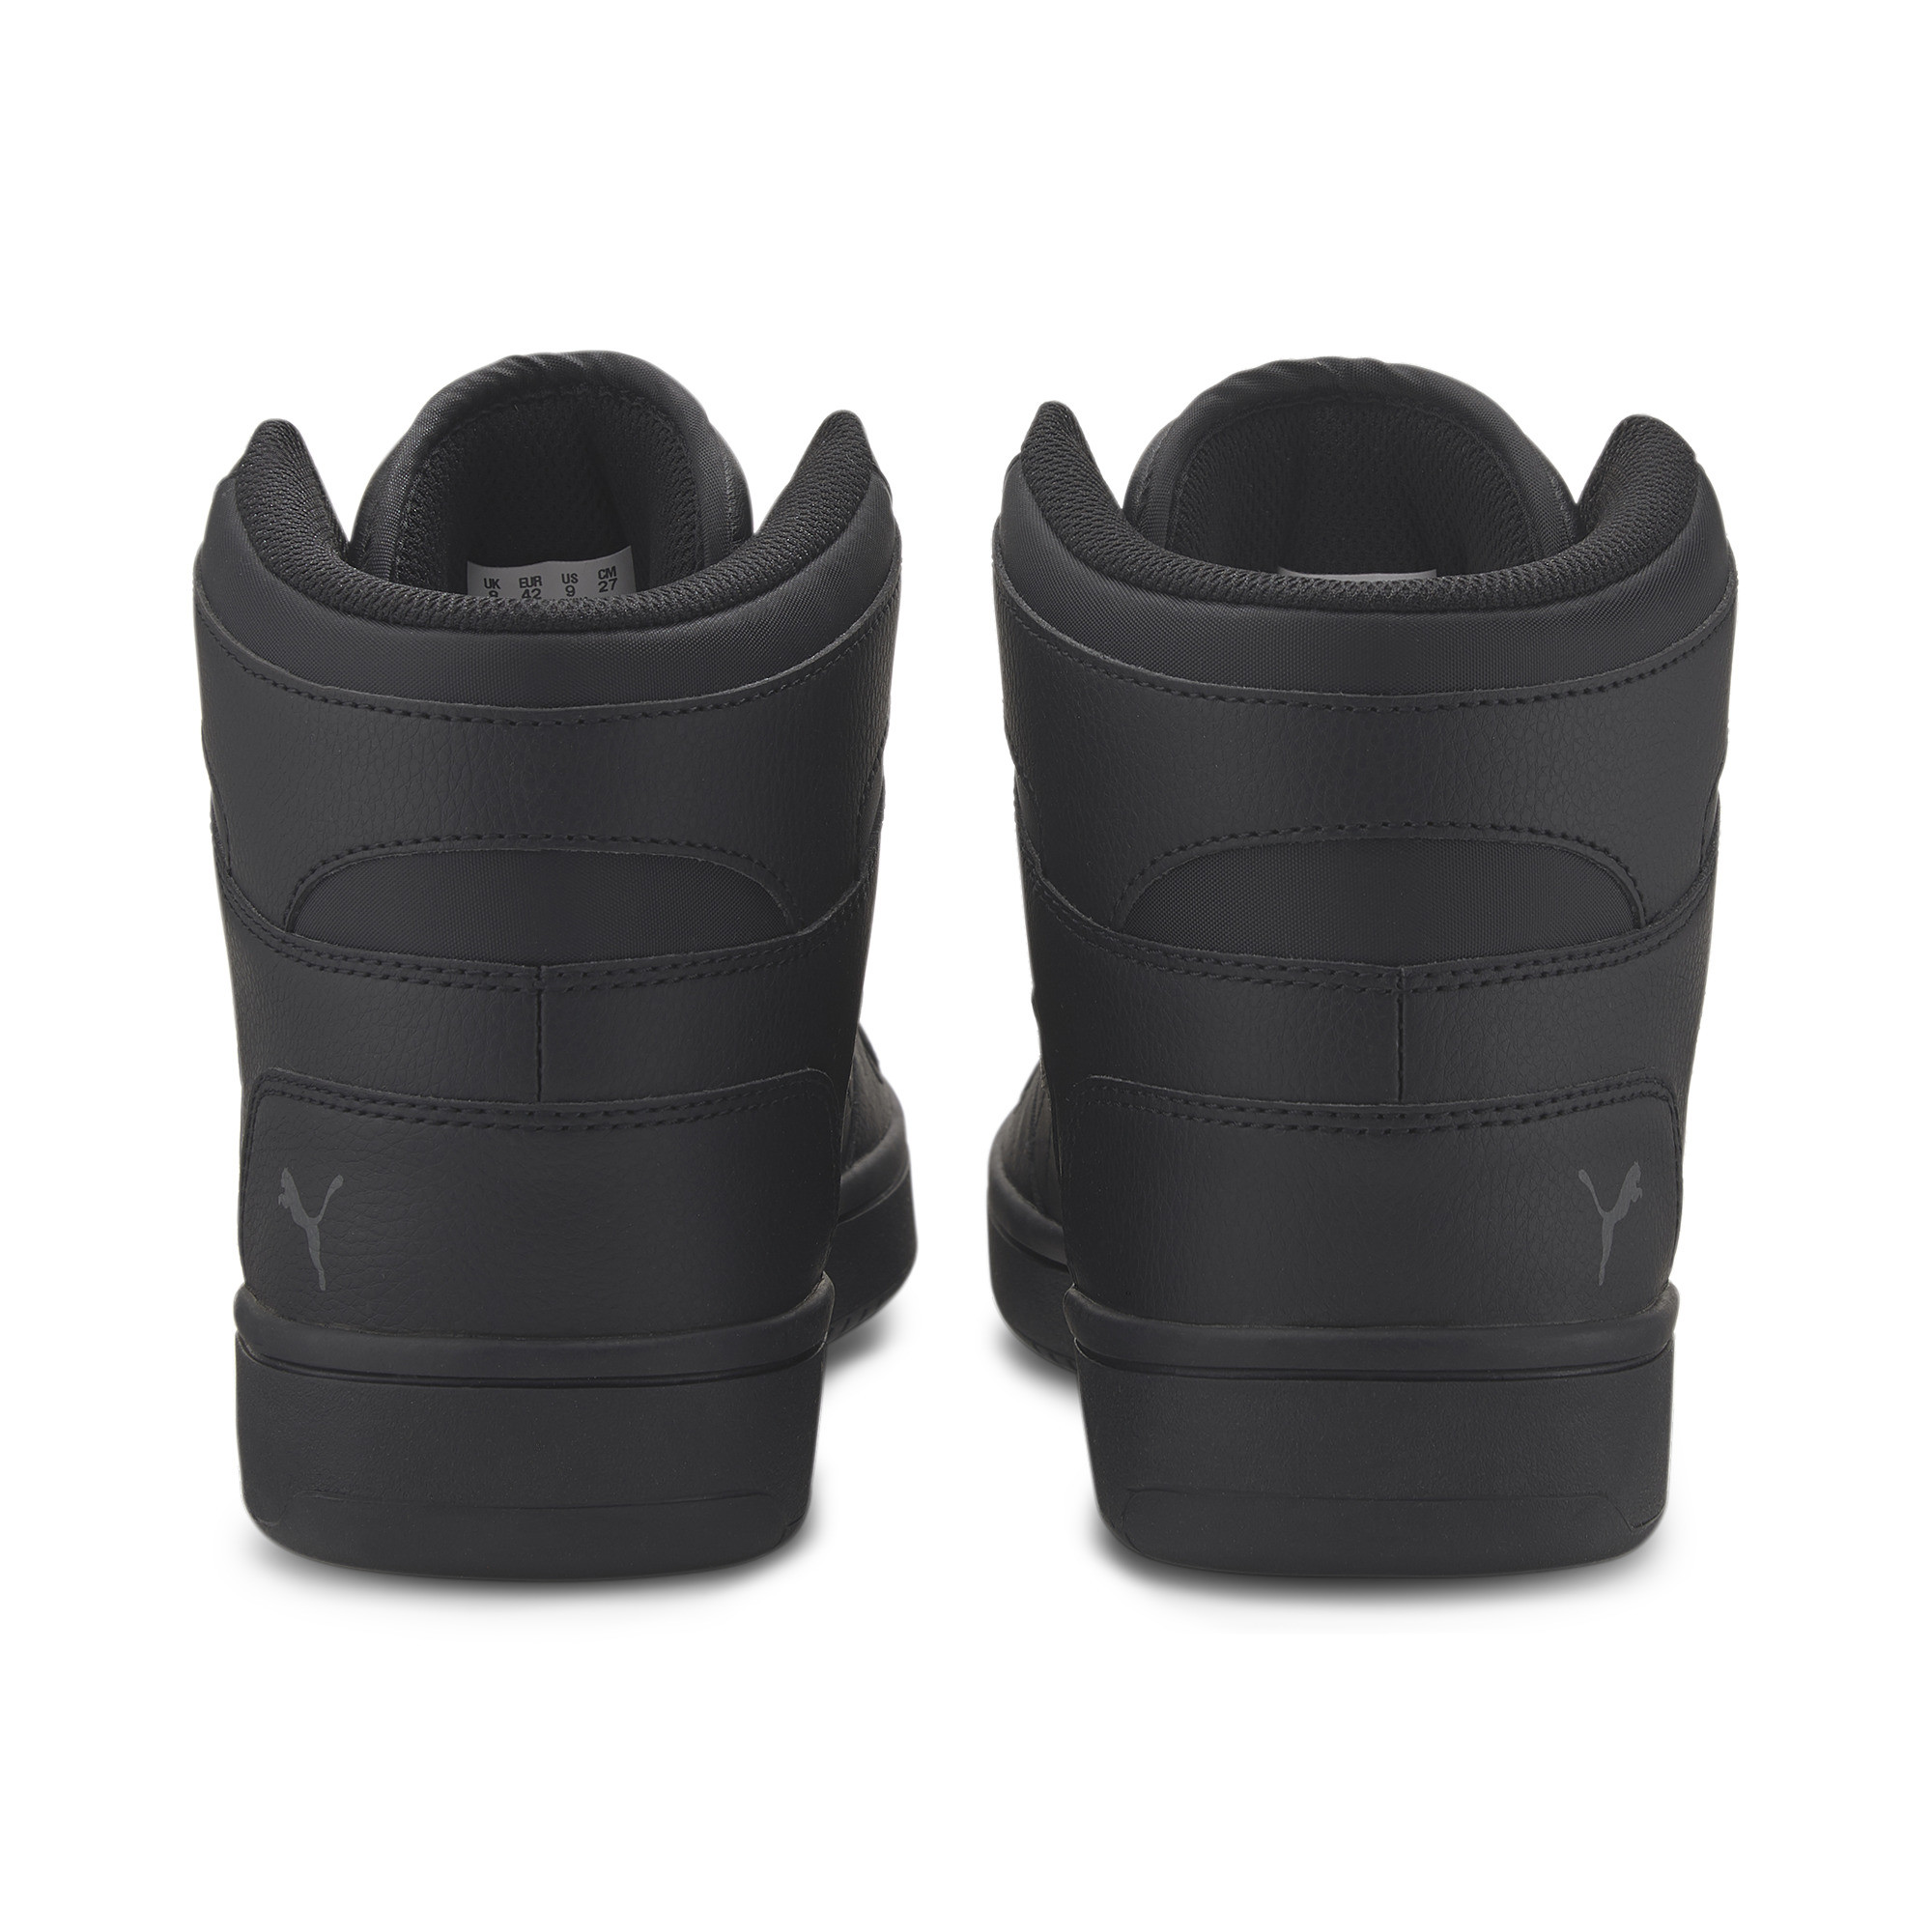 miniature 7 - Puma Men's Rebound LayUp Sneakers